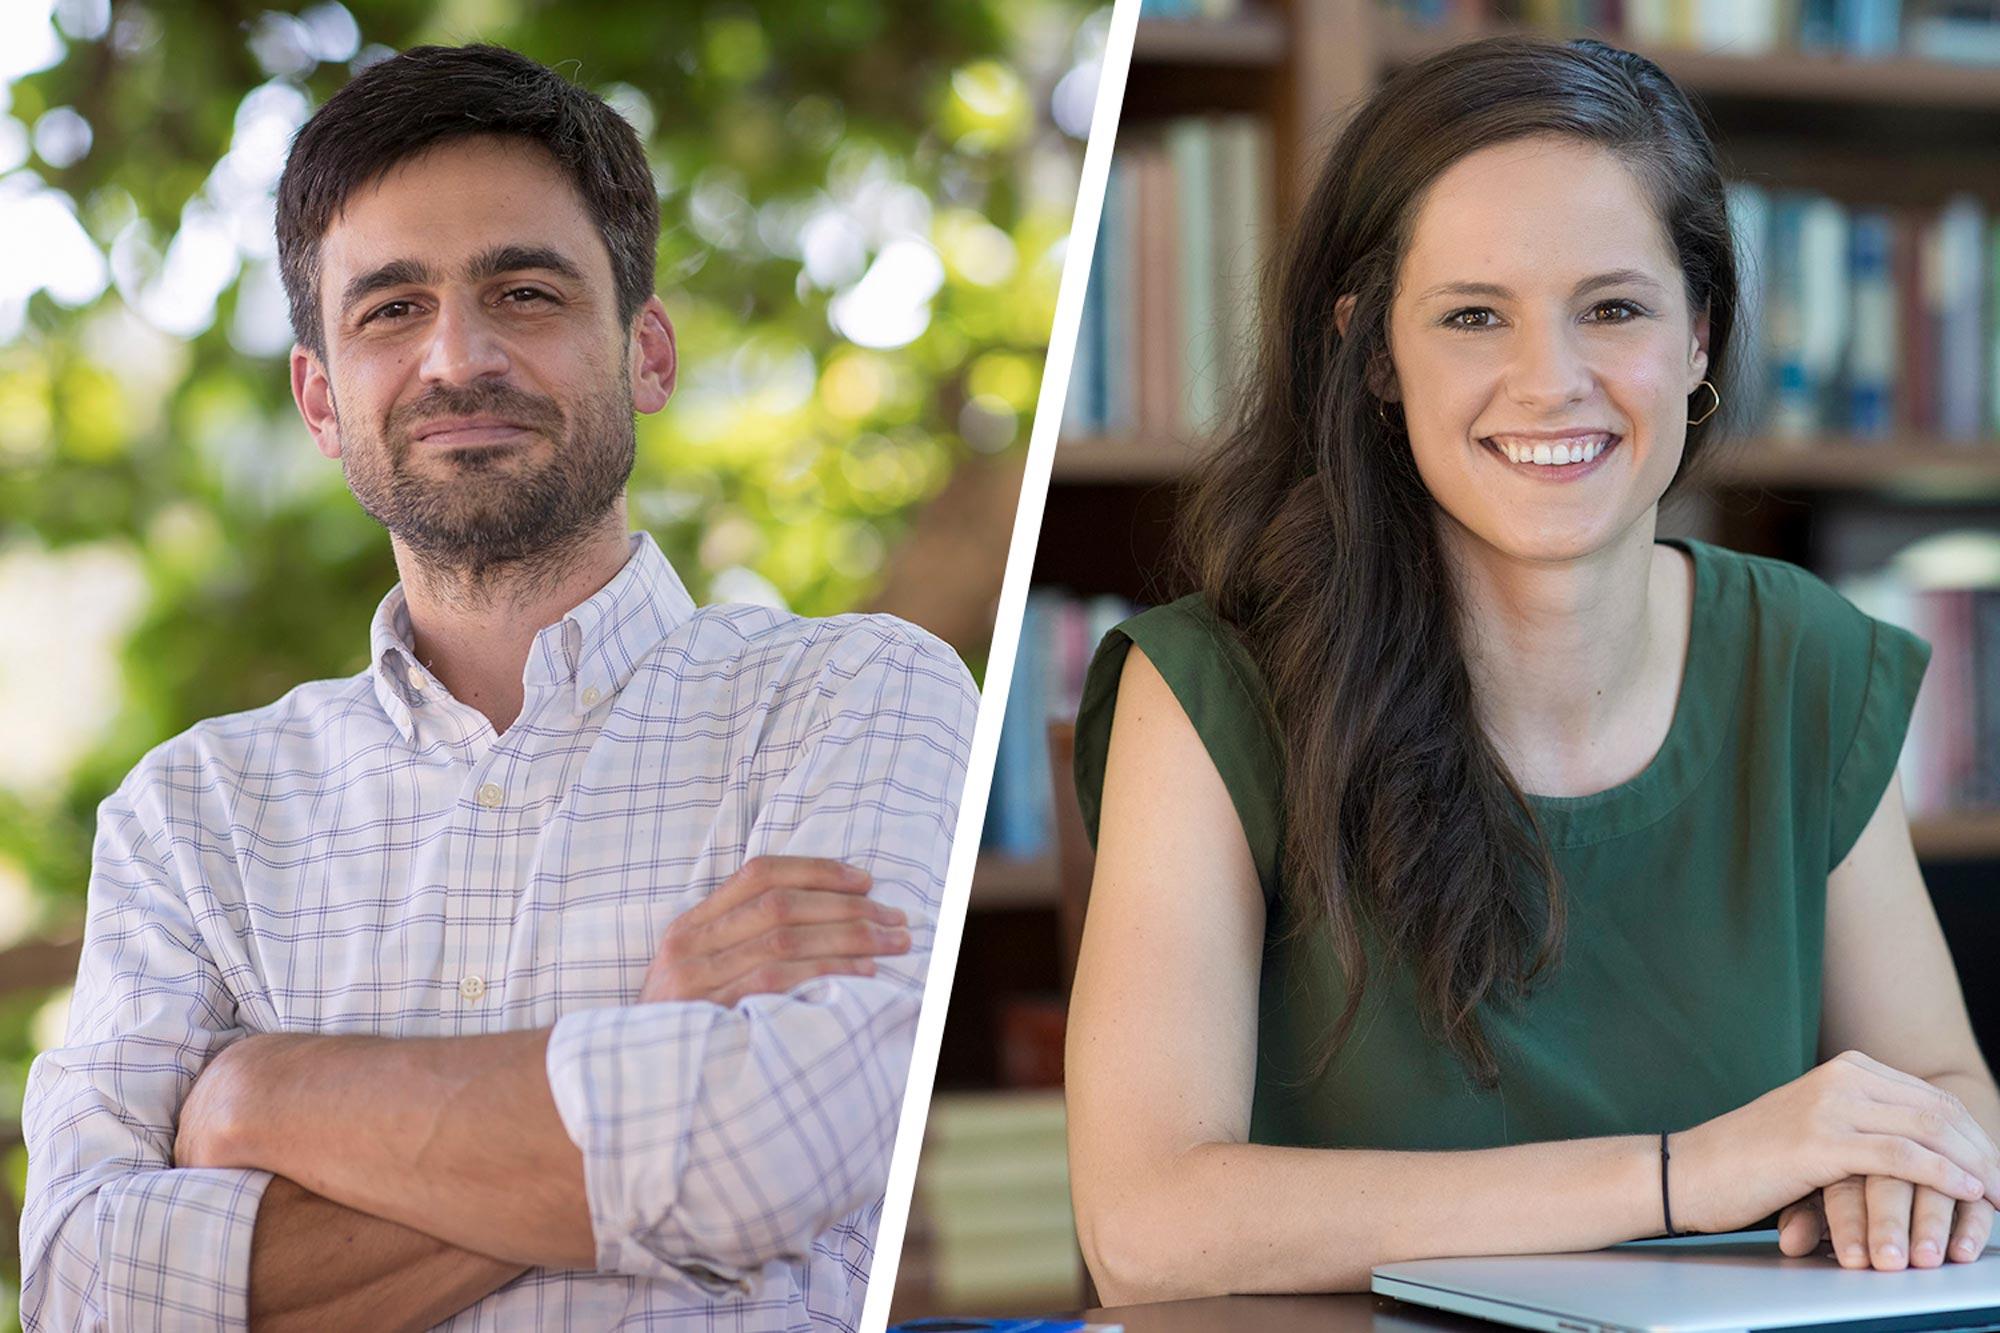 Ford Foundation Fellowships Boost Two Rising UVA Scholars - University of Virginia